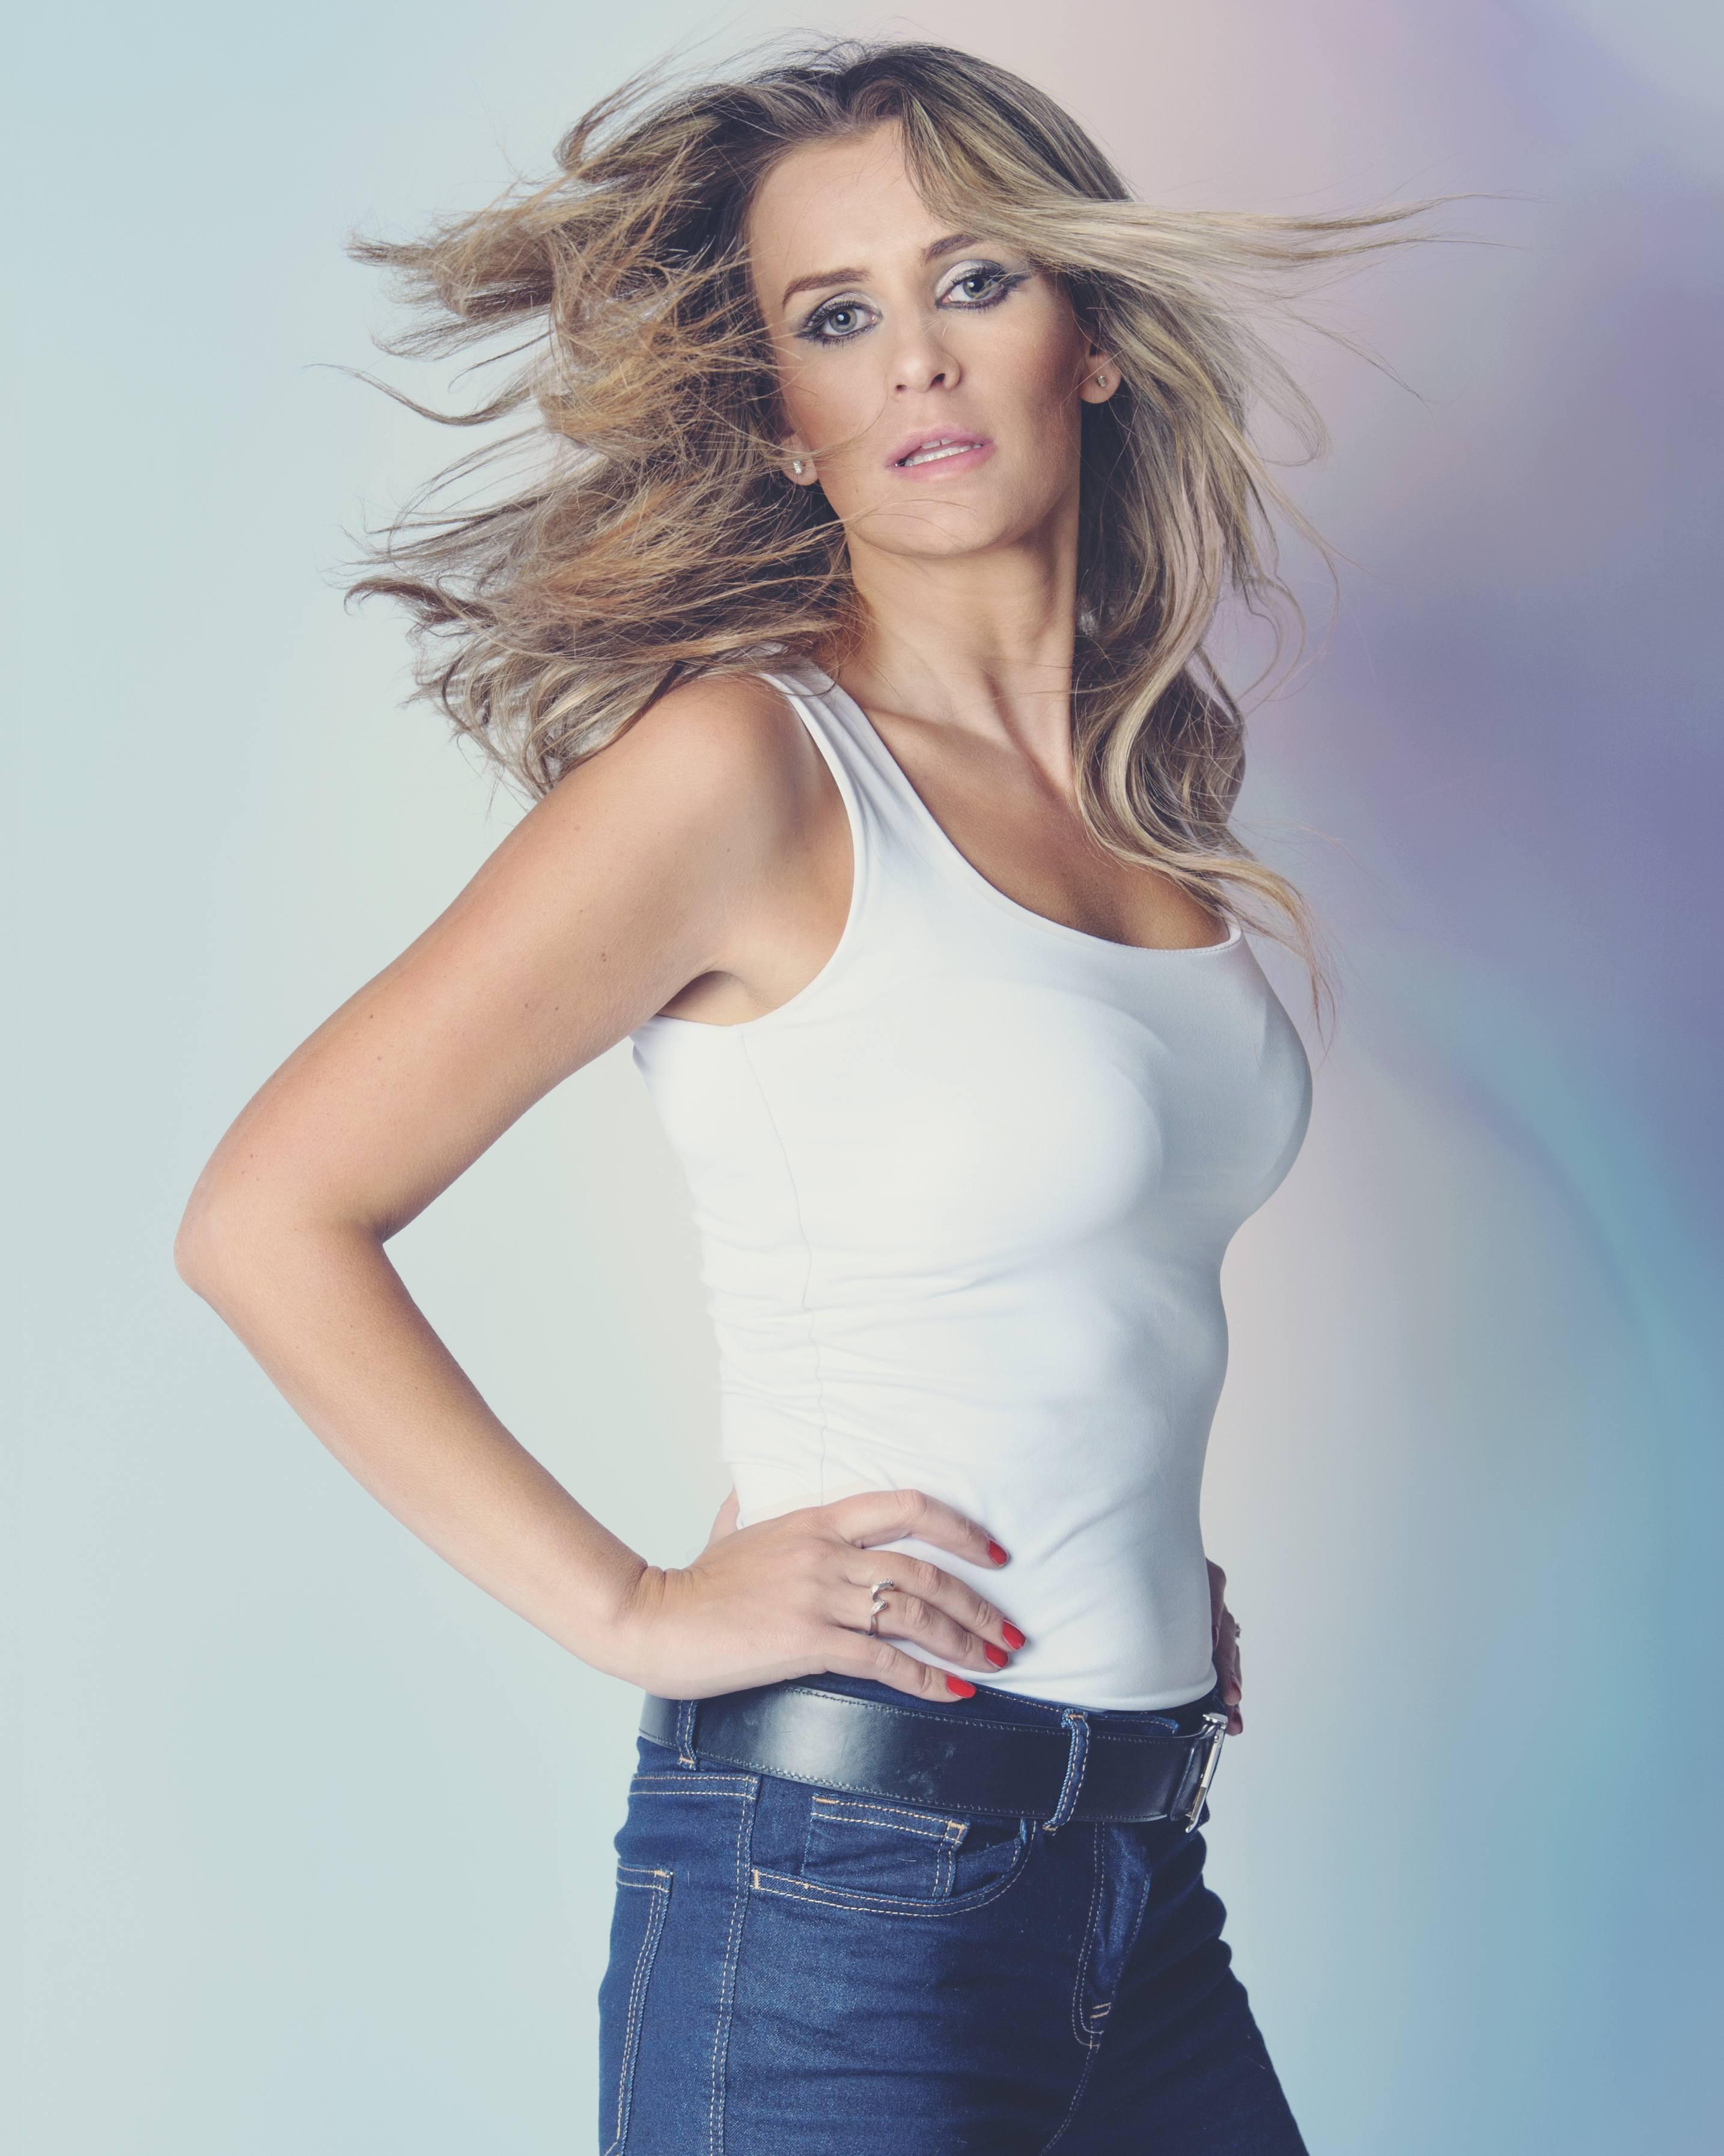 Female-Model-Leeds-Yorkshire-Photographic-New-Face-Sophie9580Web.jpg#asset:45905